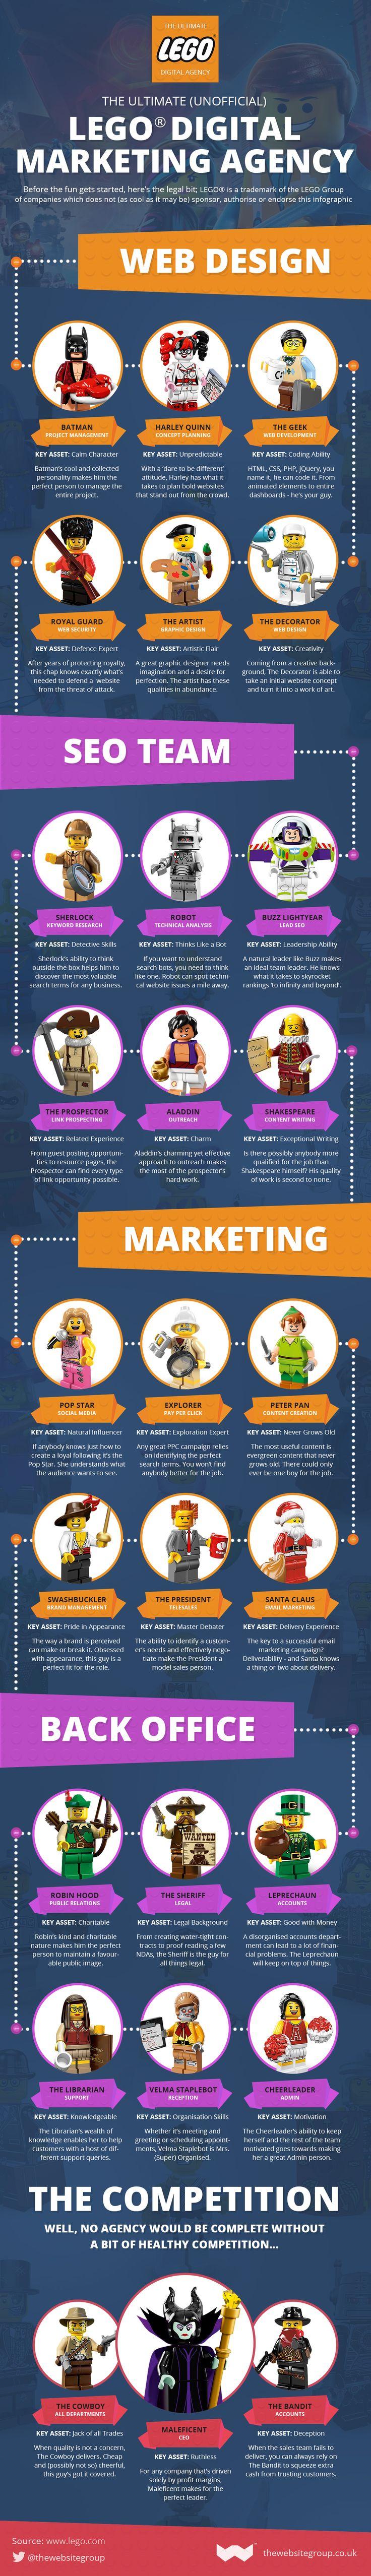 The Ultimate Lego Digital Marketing Agency